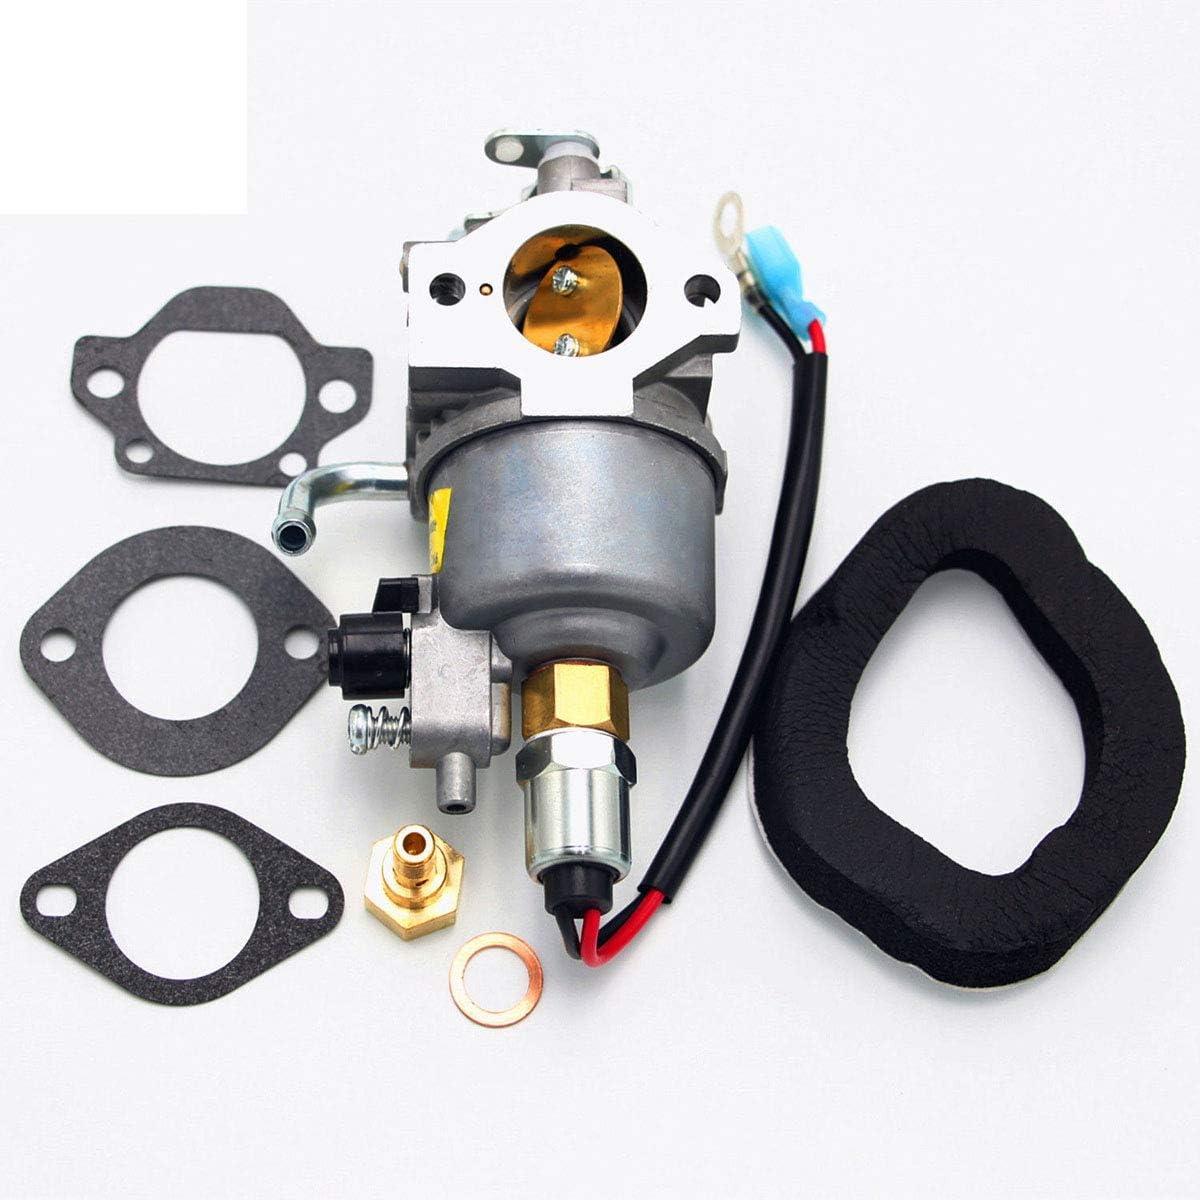 BH-Motor New Carburetor Carb for Onan Cummins 146-0785 RV Generator KY Series A042P619 Replaces 146-0803